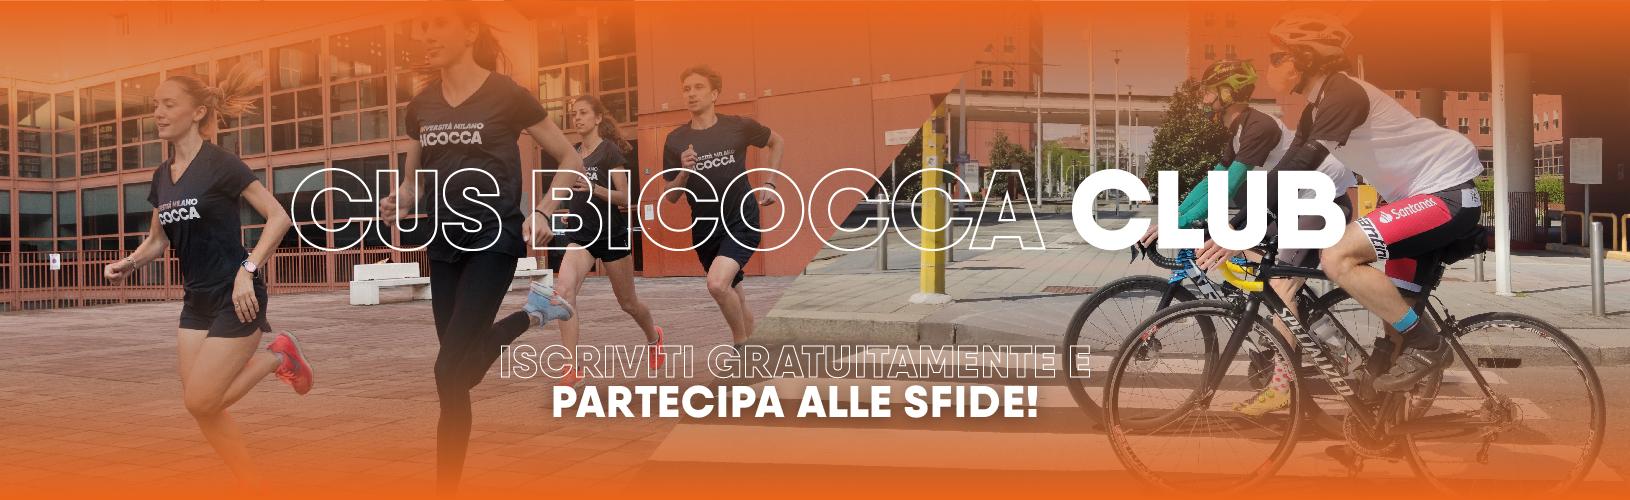 CUS Bicocca Club